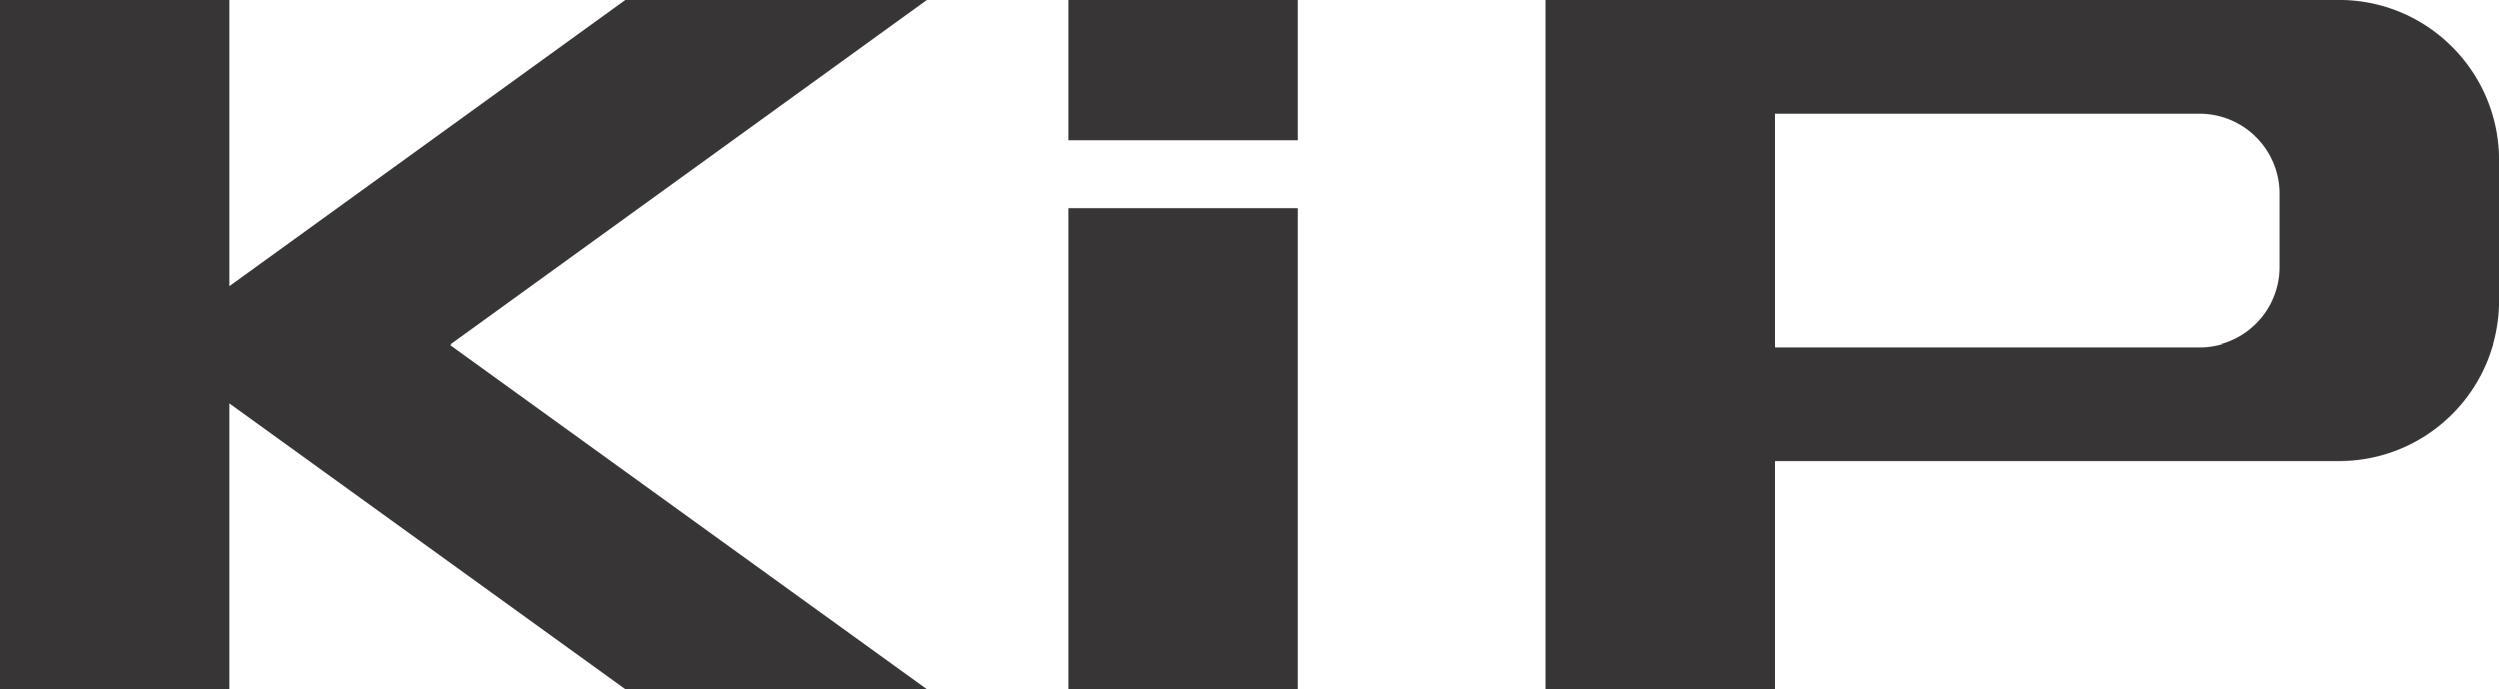 Kip Logo png